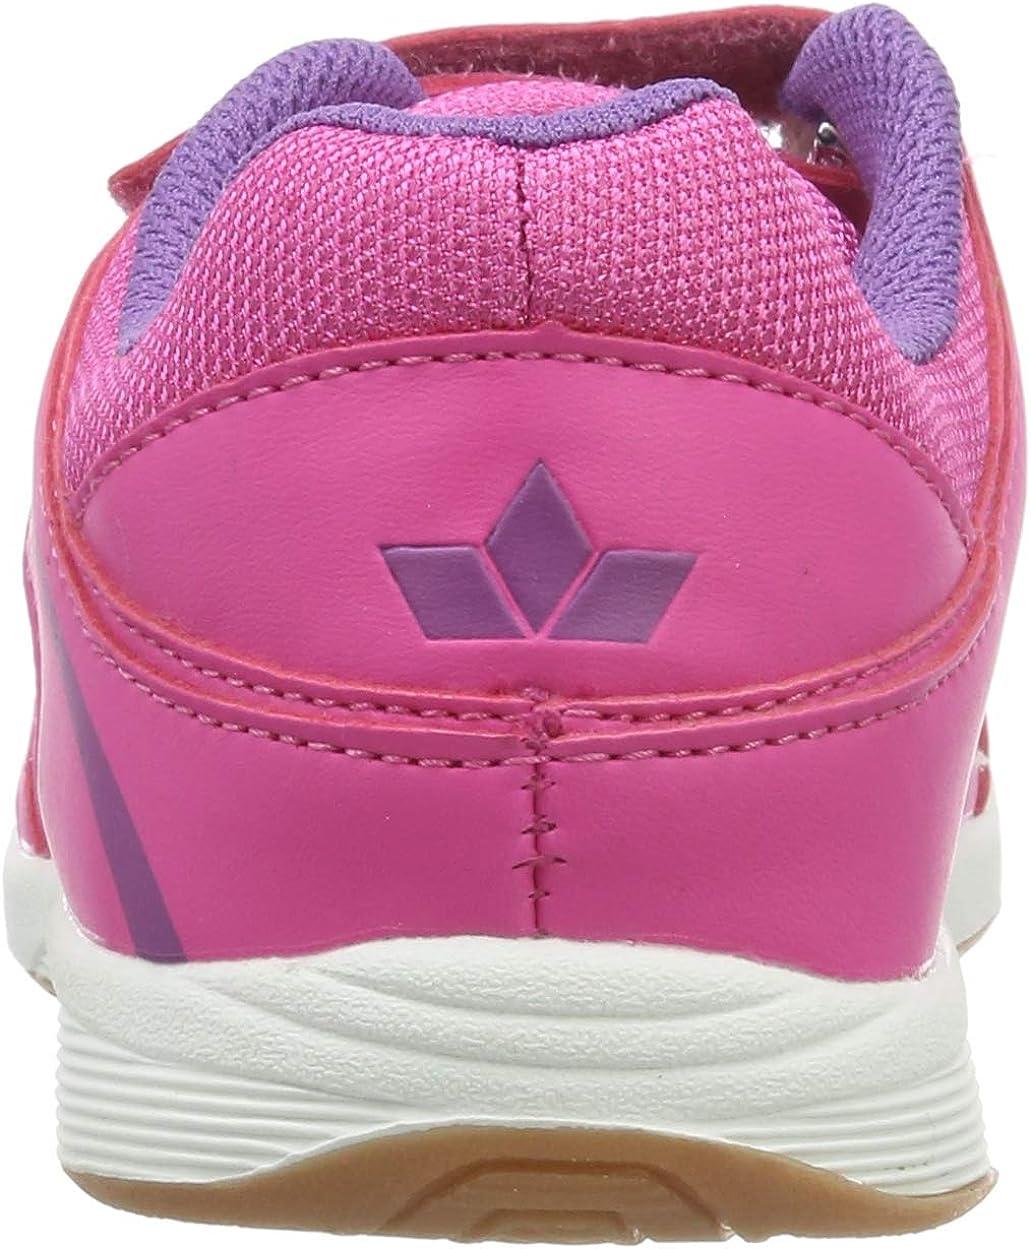 Lico Jungen Active Boy V Multisport Indoor Schuhe Pink//Lila 34 EU